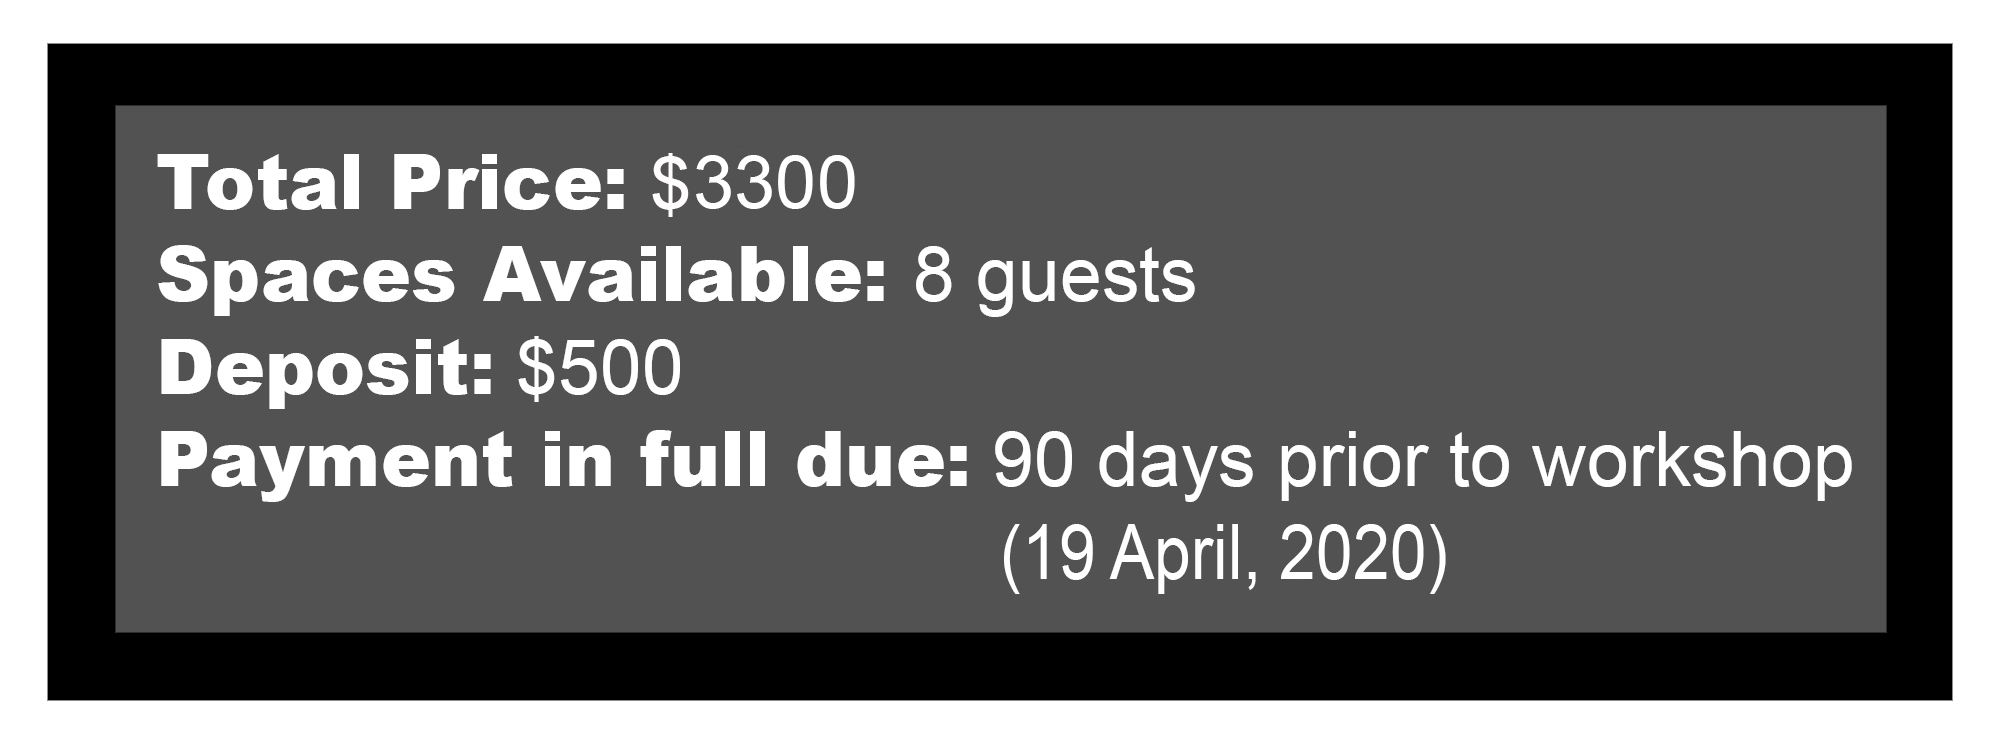 Price info.jpg